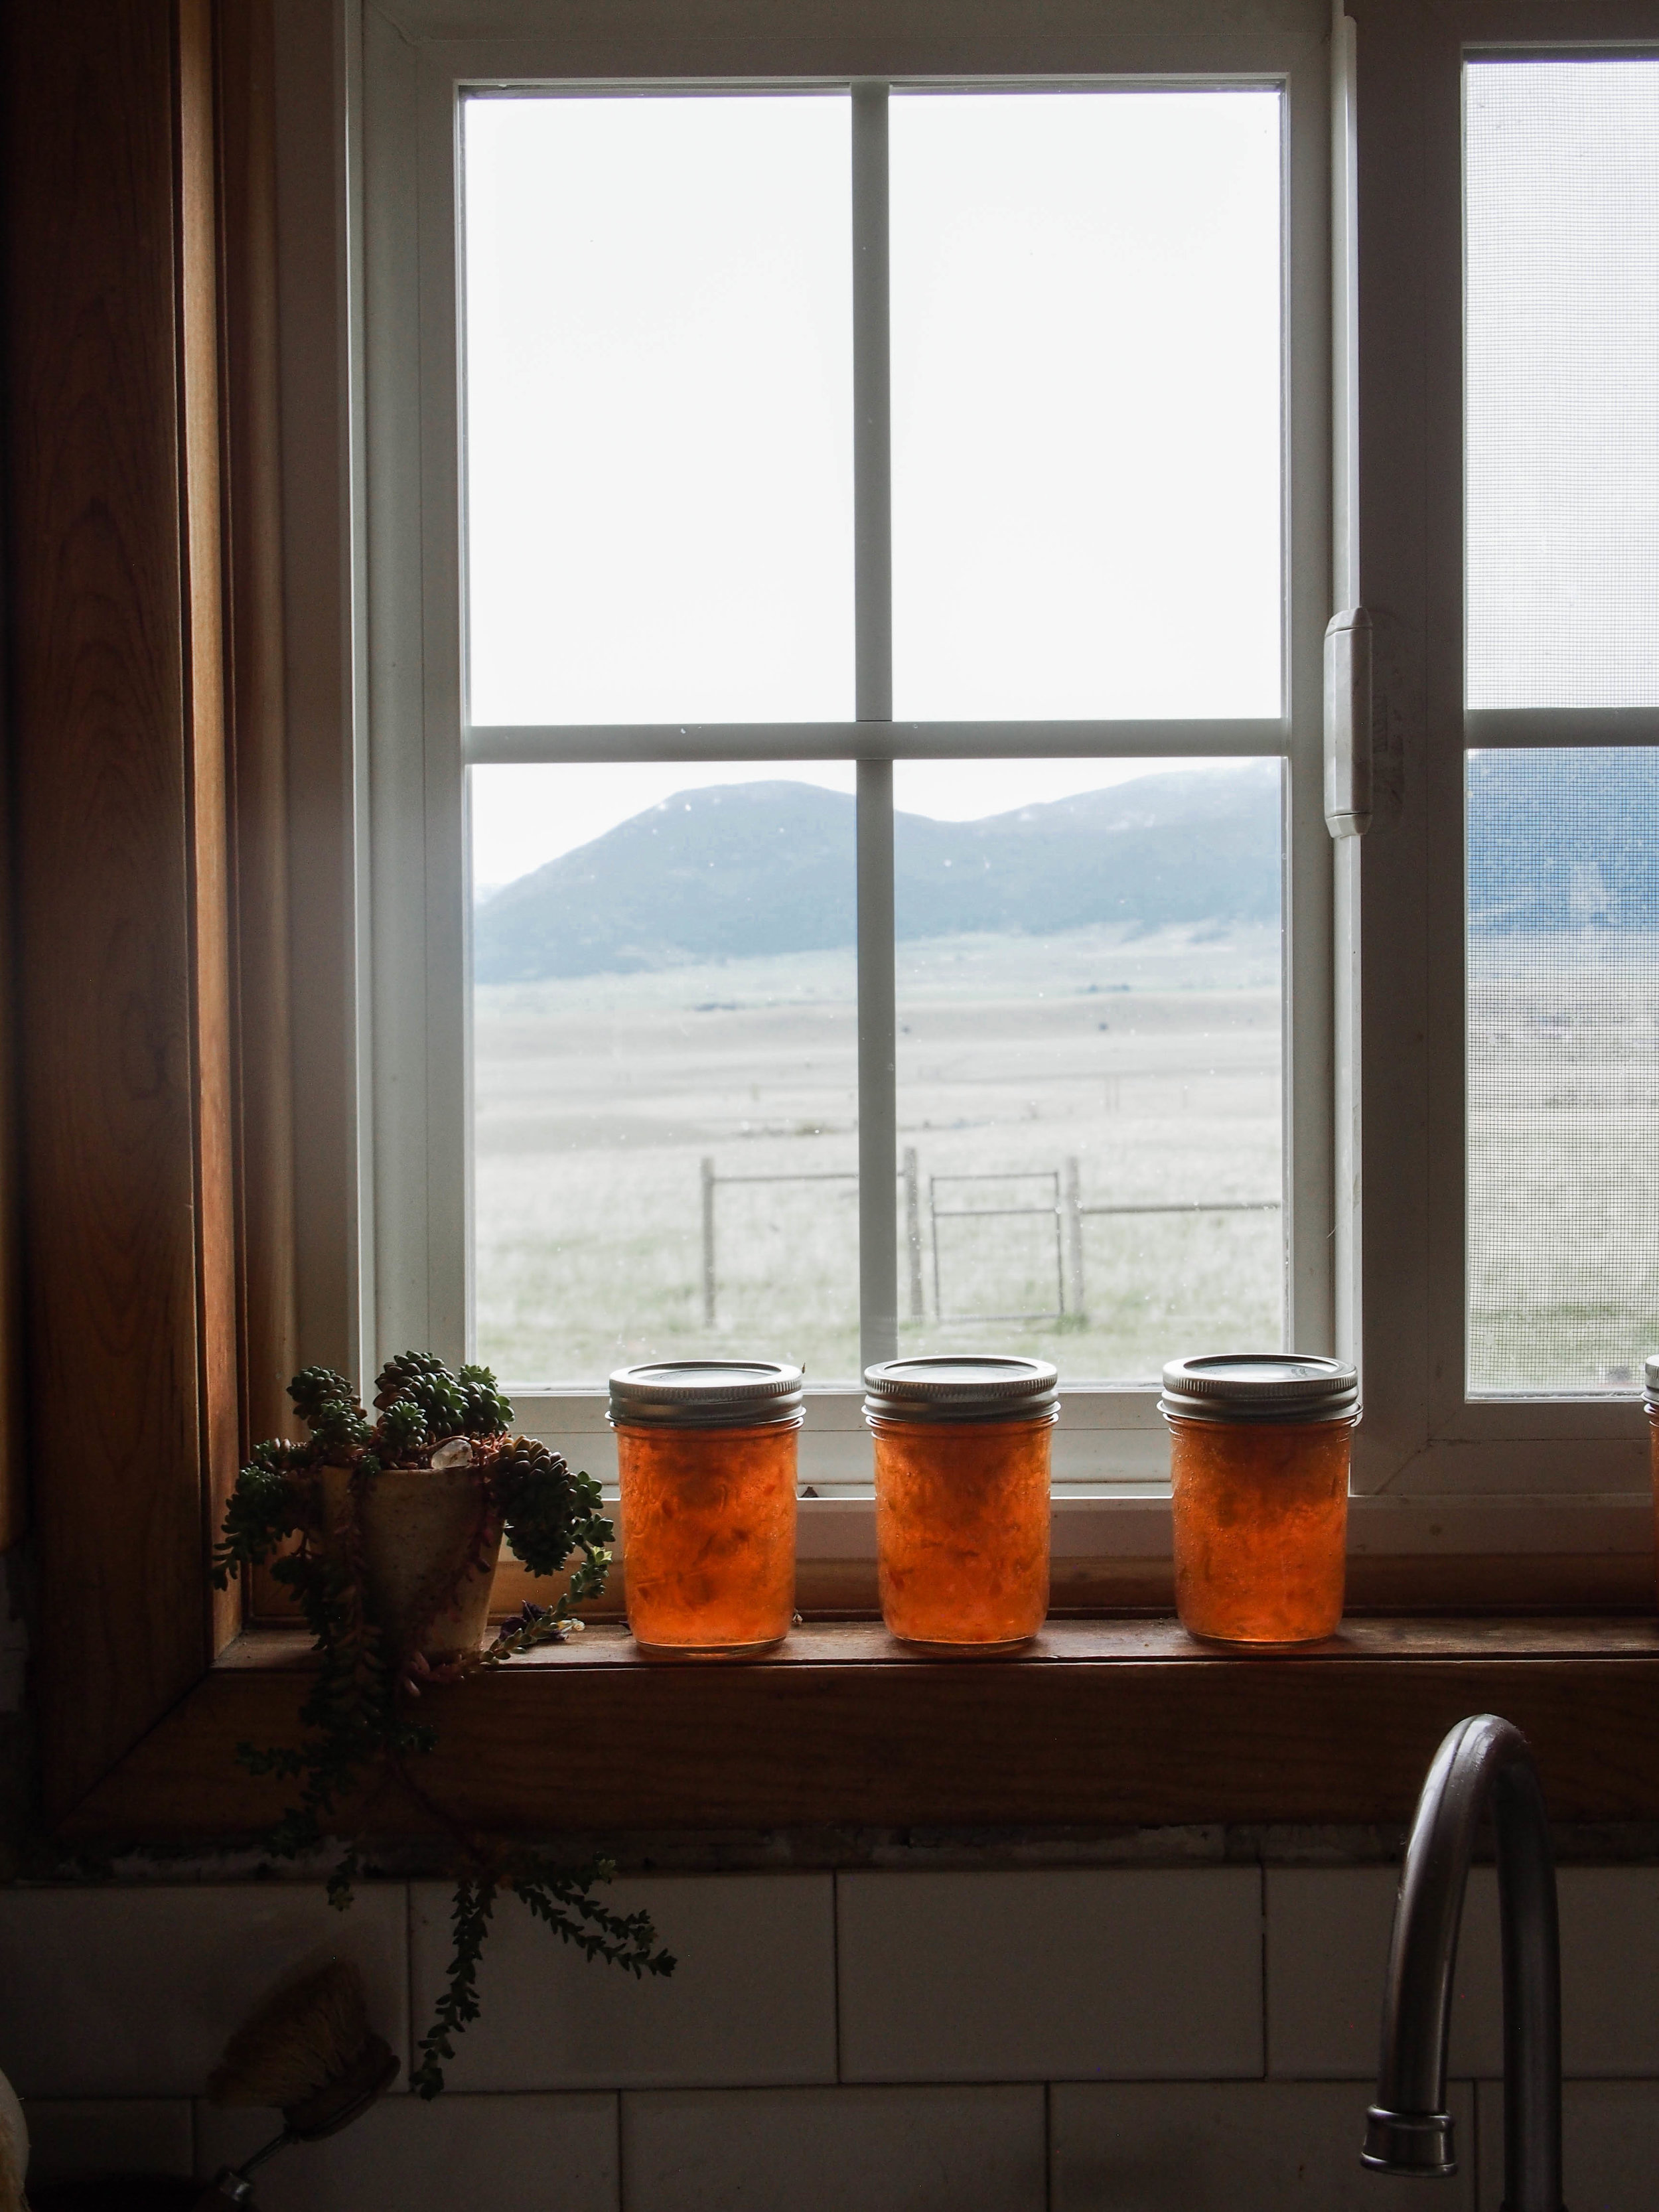 rhubarb jam in a ktichen window